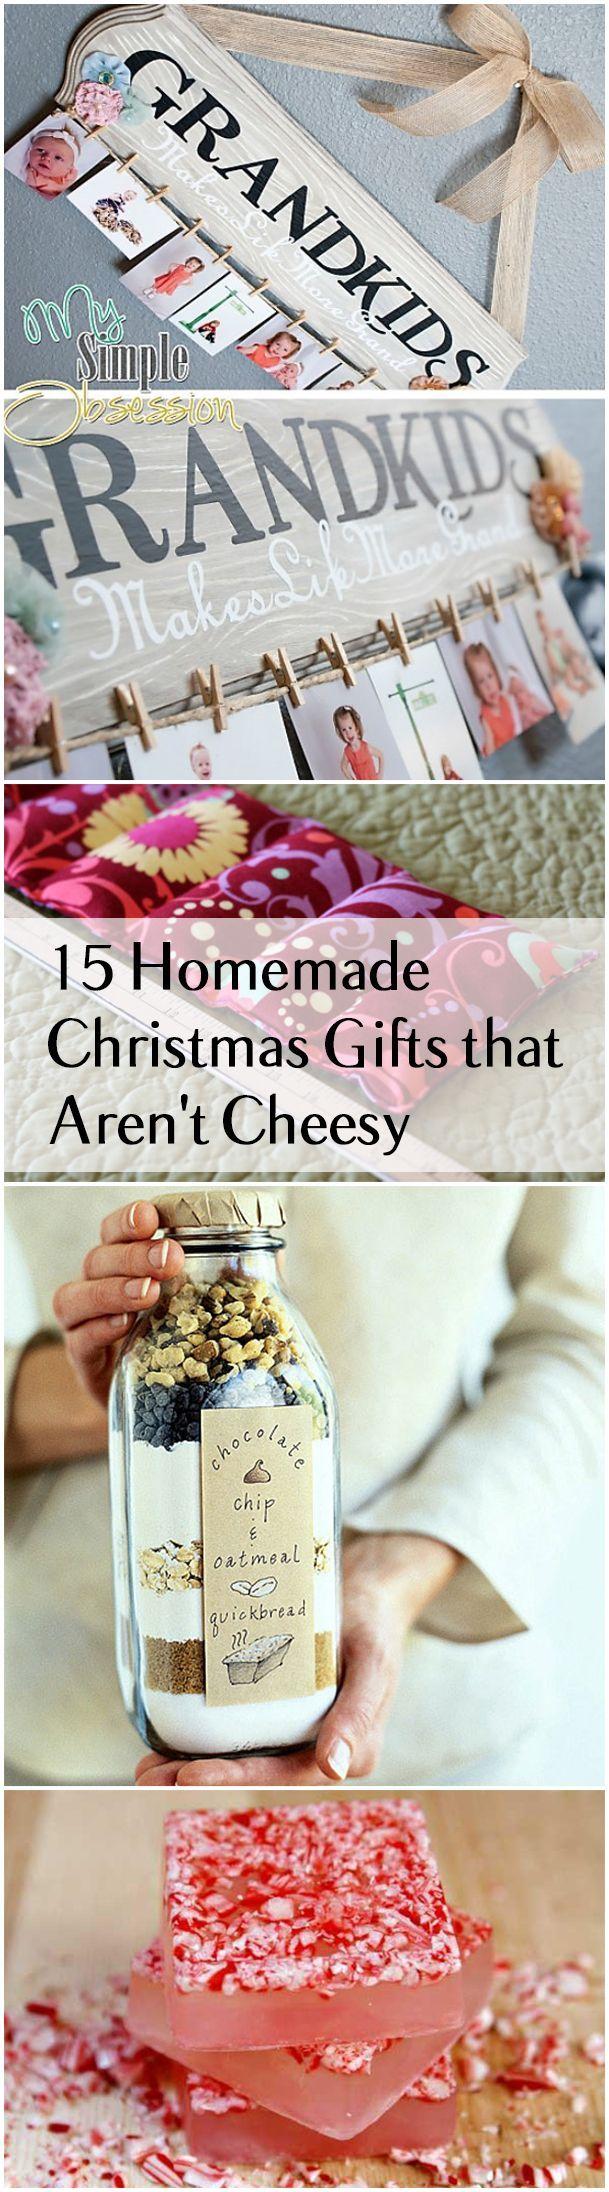 15 homemade christmas gifts that arent cheesy regalitos navidad 15 homemade christmas gifts that arent cheesy solutioingenieria Choice Image